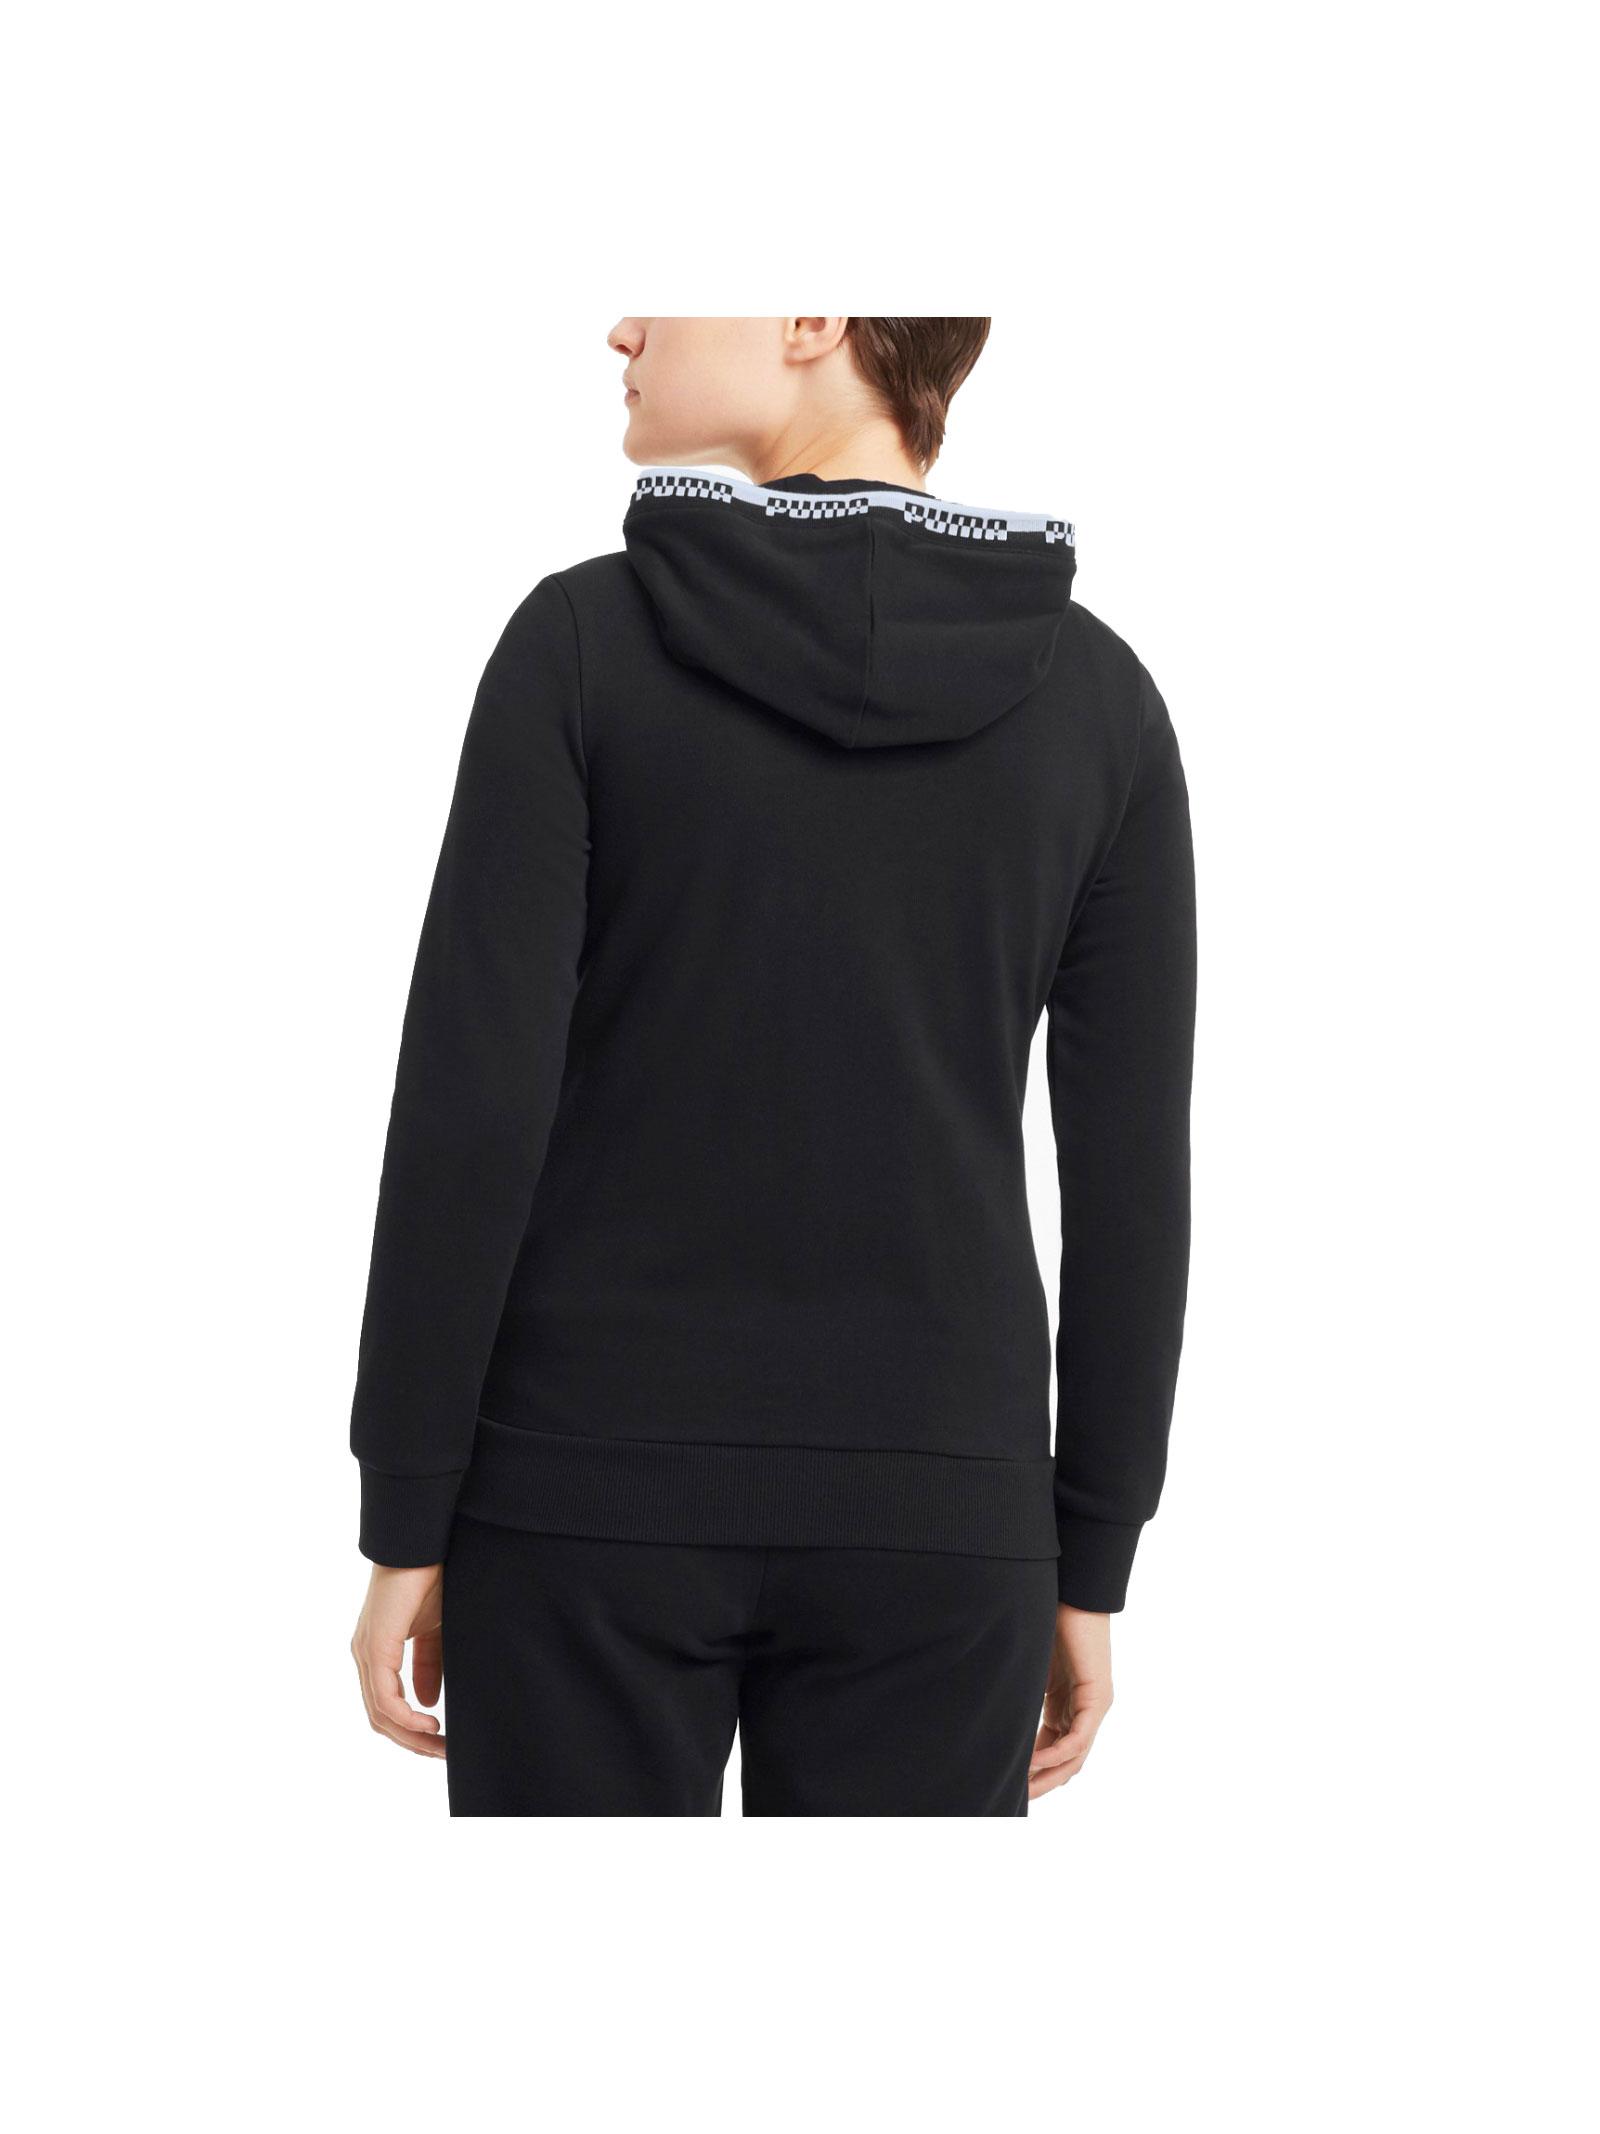 PUMA | Sweatshirts | 585911-01